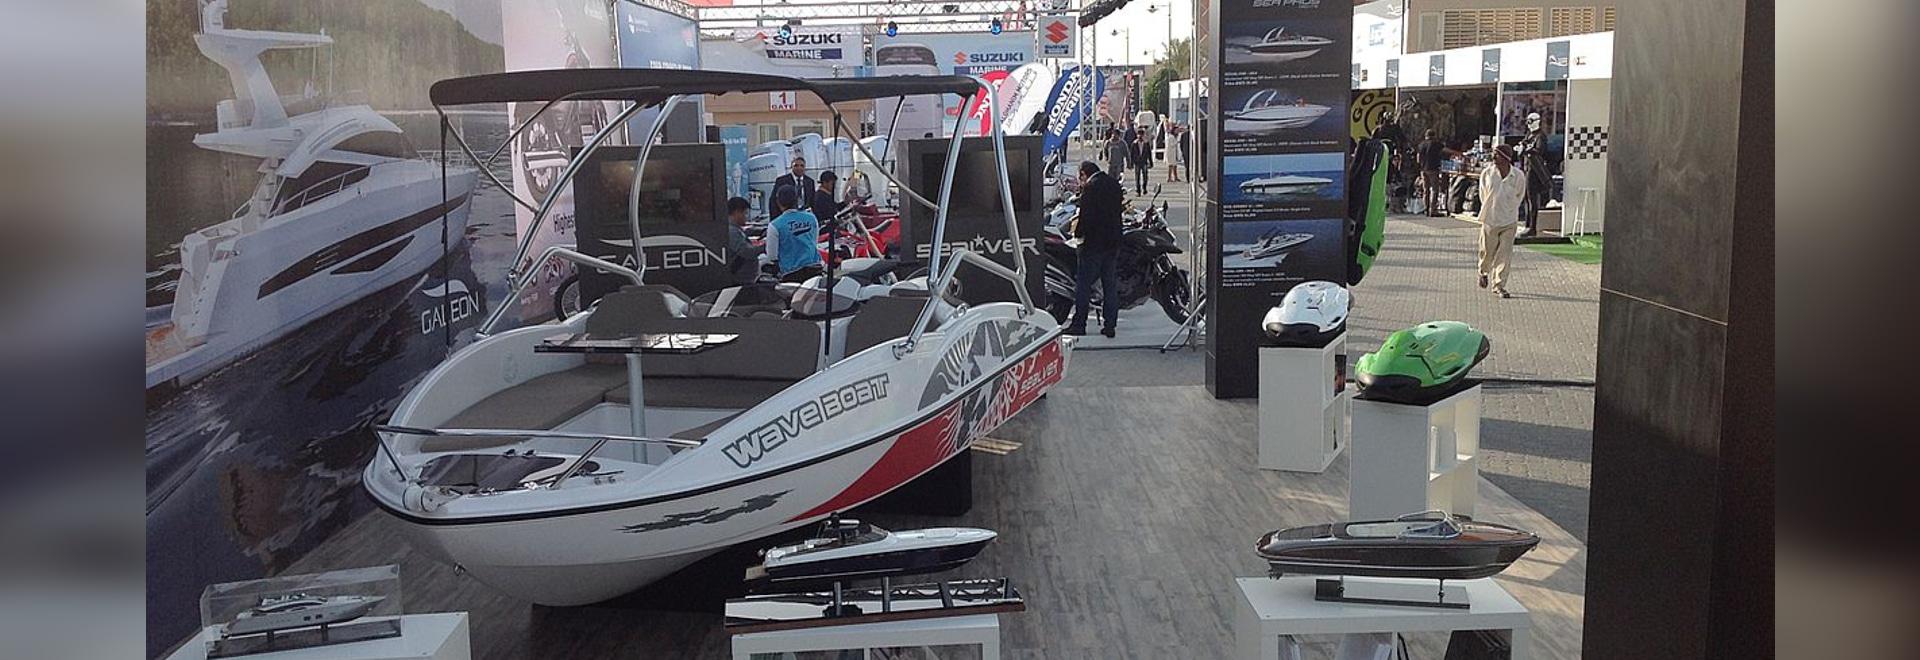 Kuwait Yacht Show - 3rd till 7th February 2015